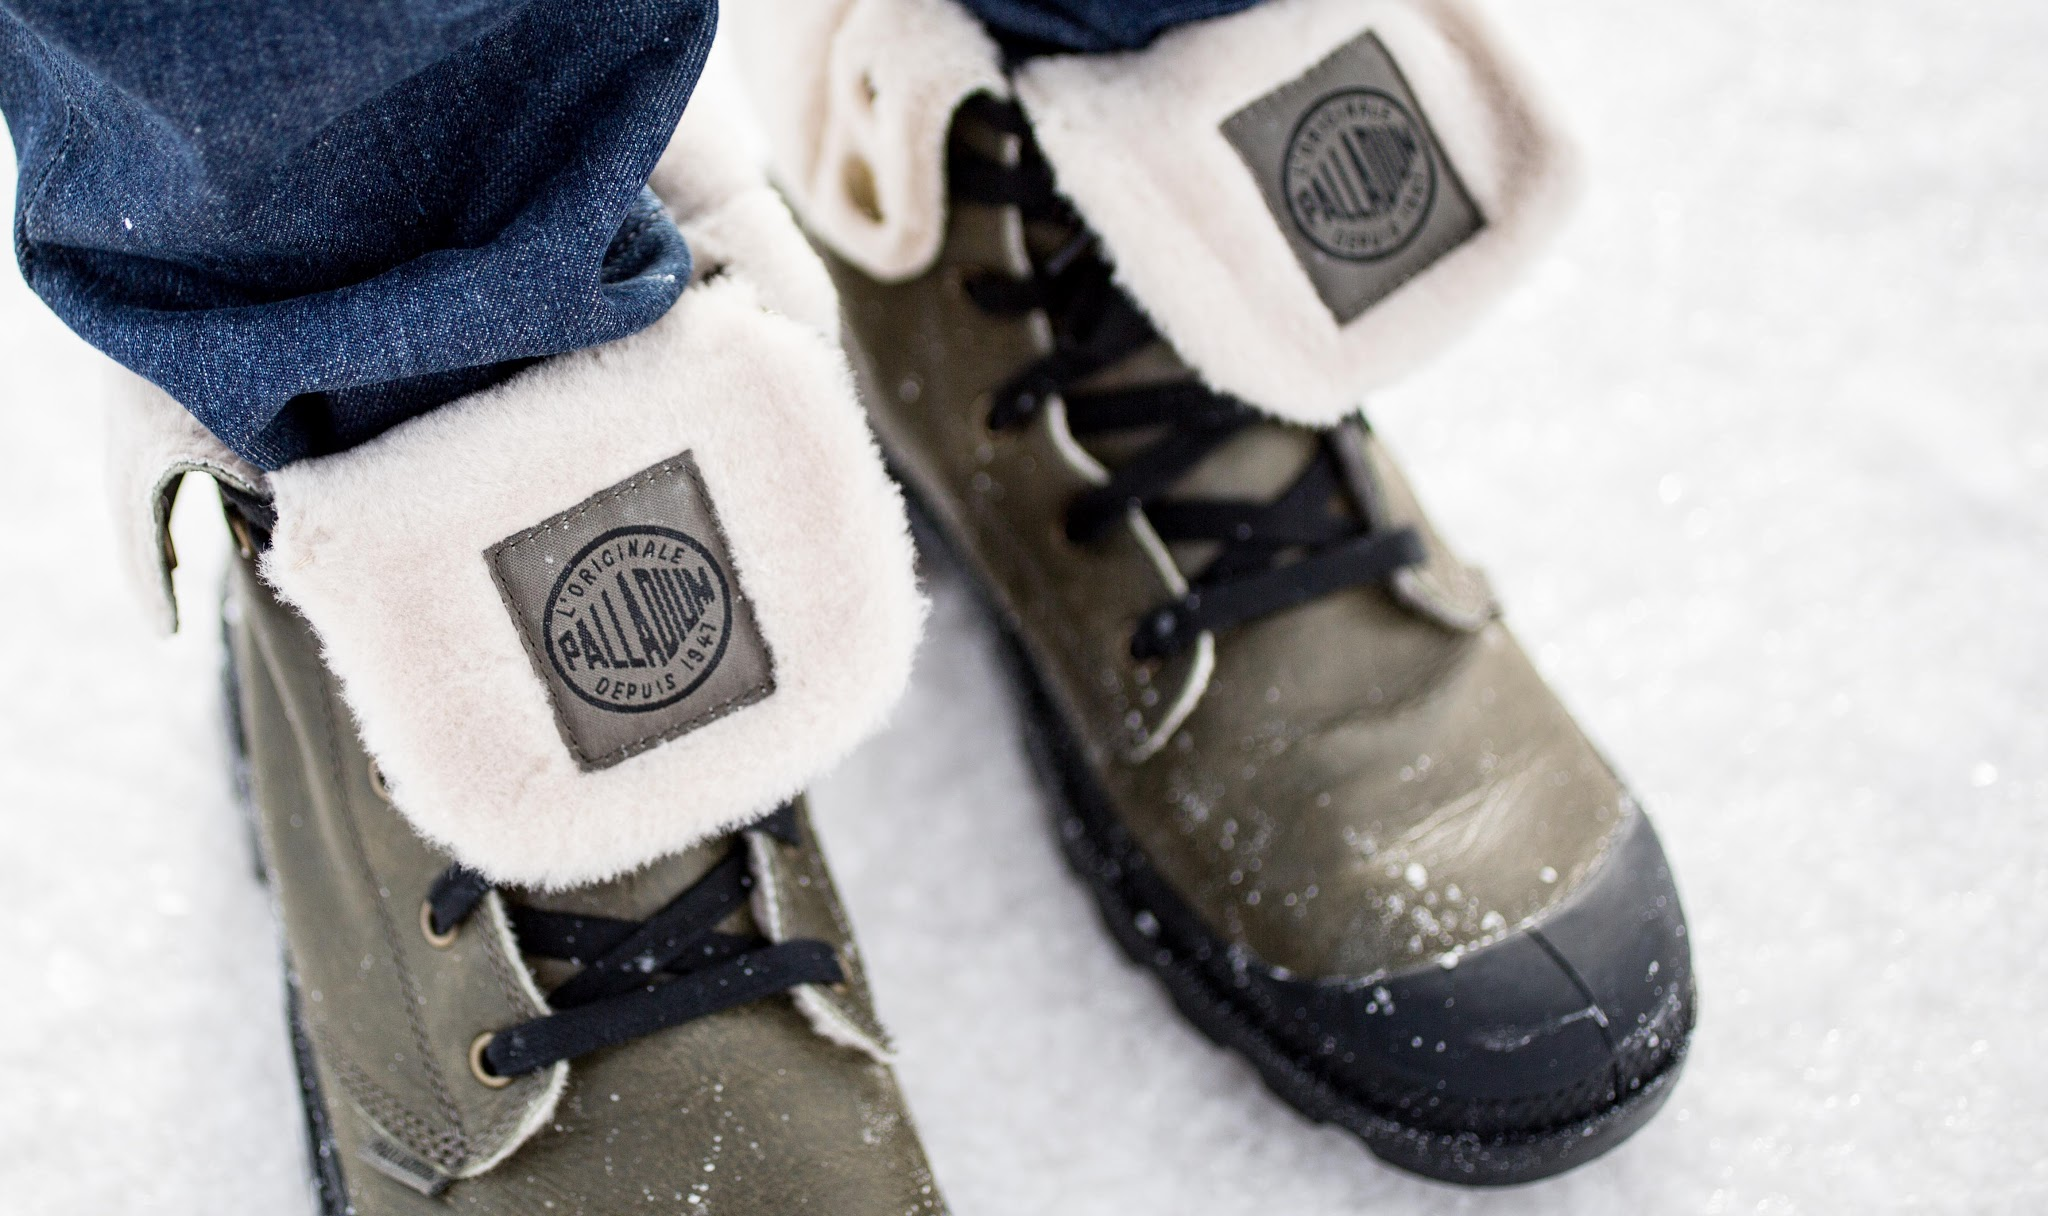 Palladium Boots Wool Lined Baggy Lt